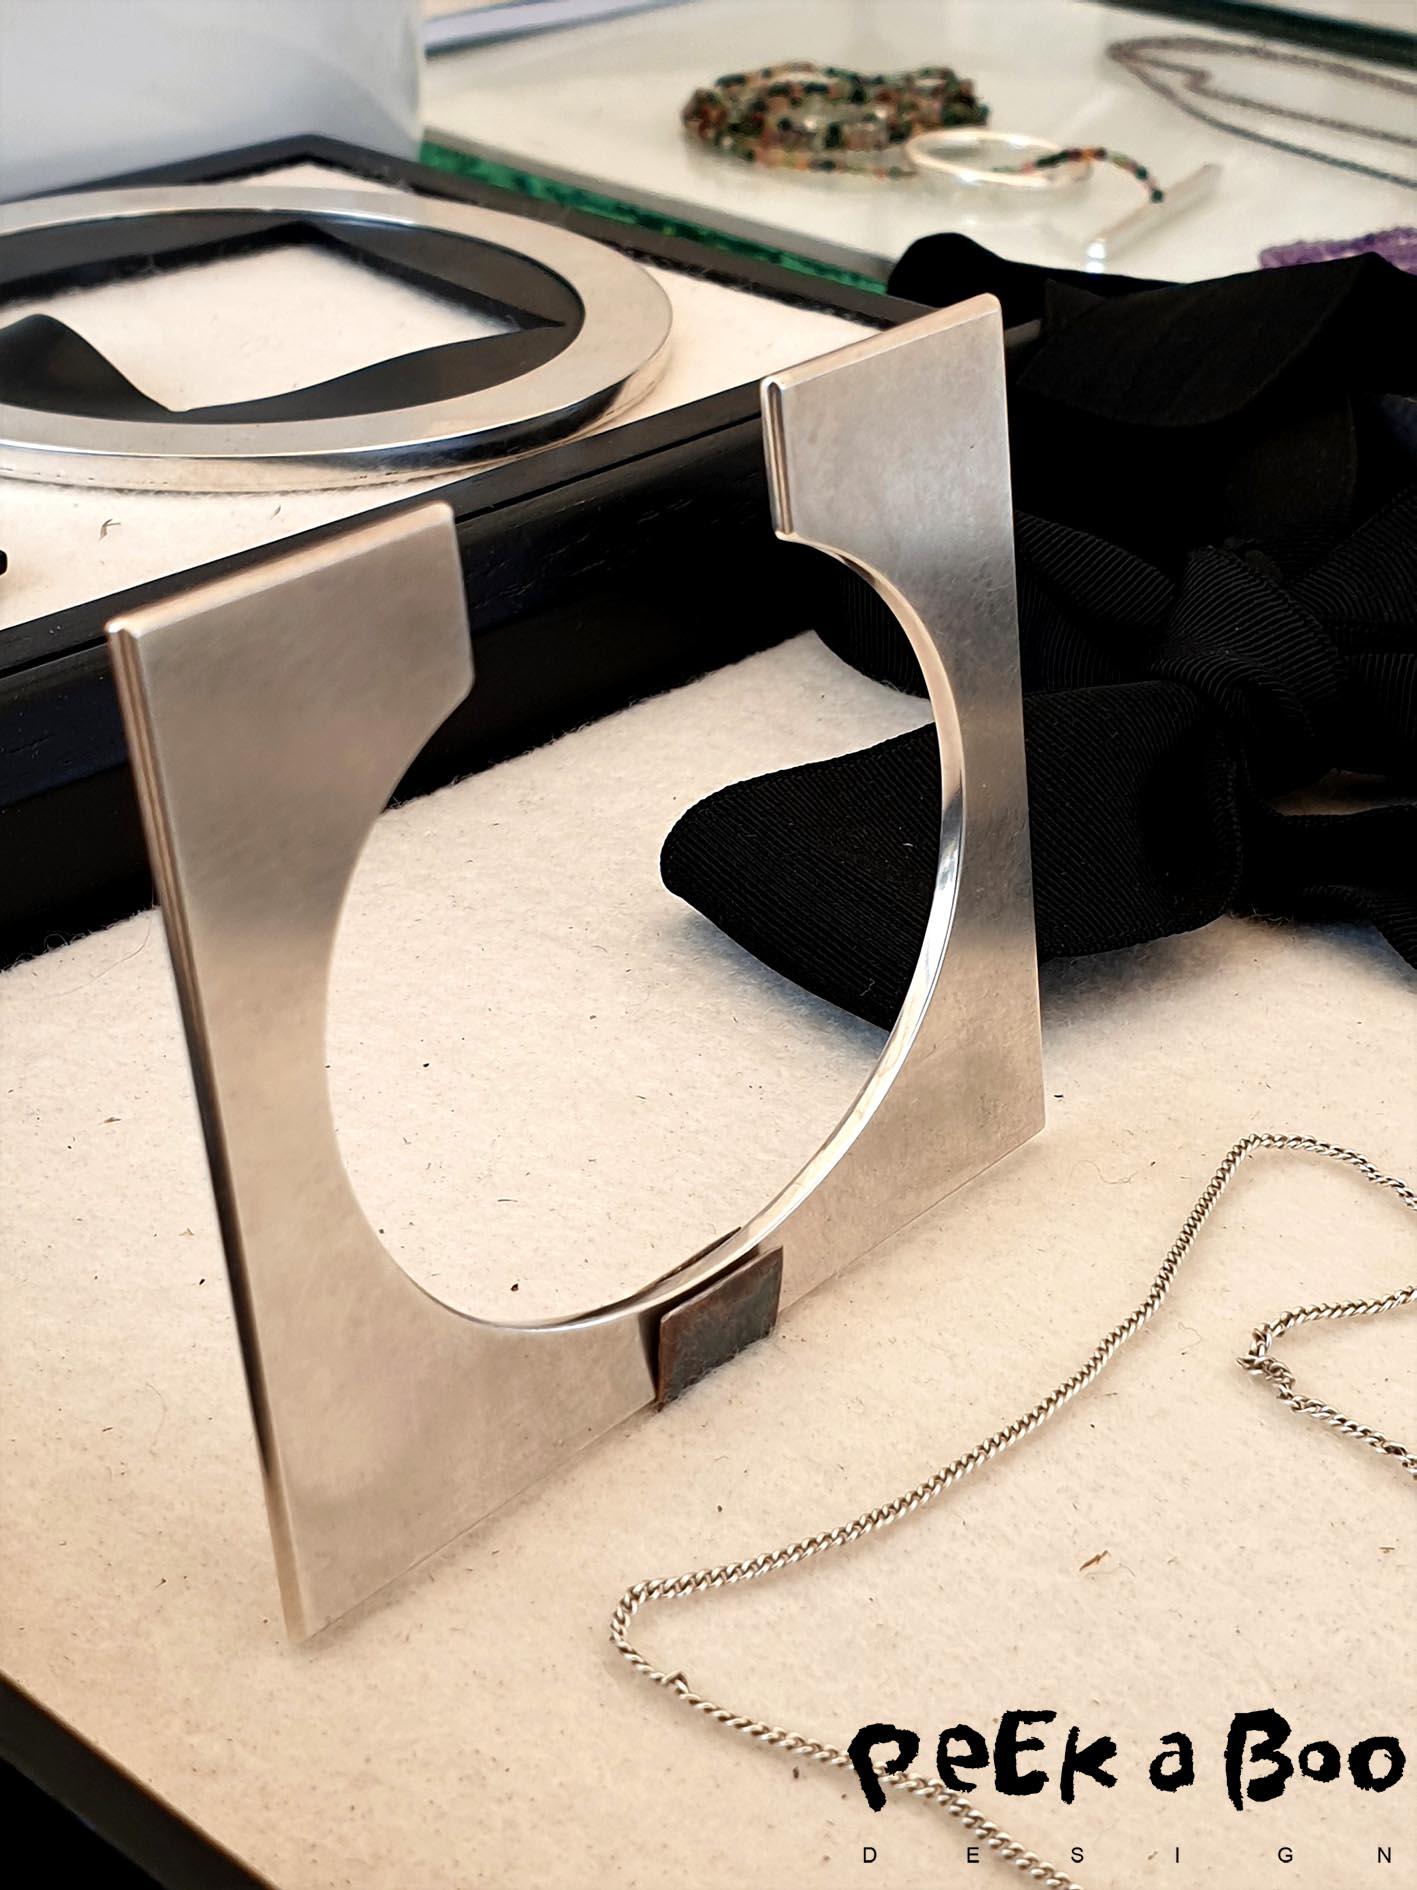 karina noyons grafic jewellery made of silver and black nylon.